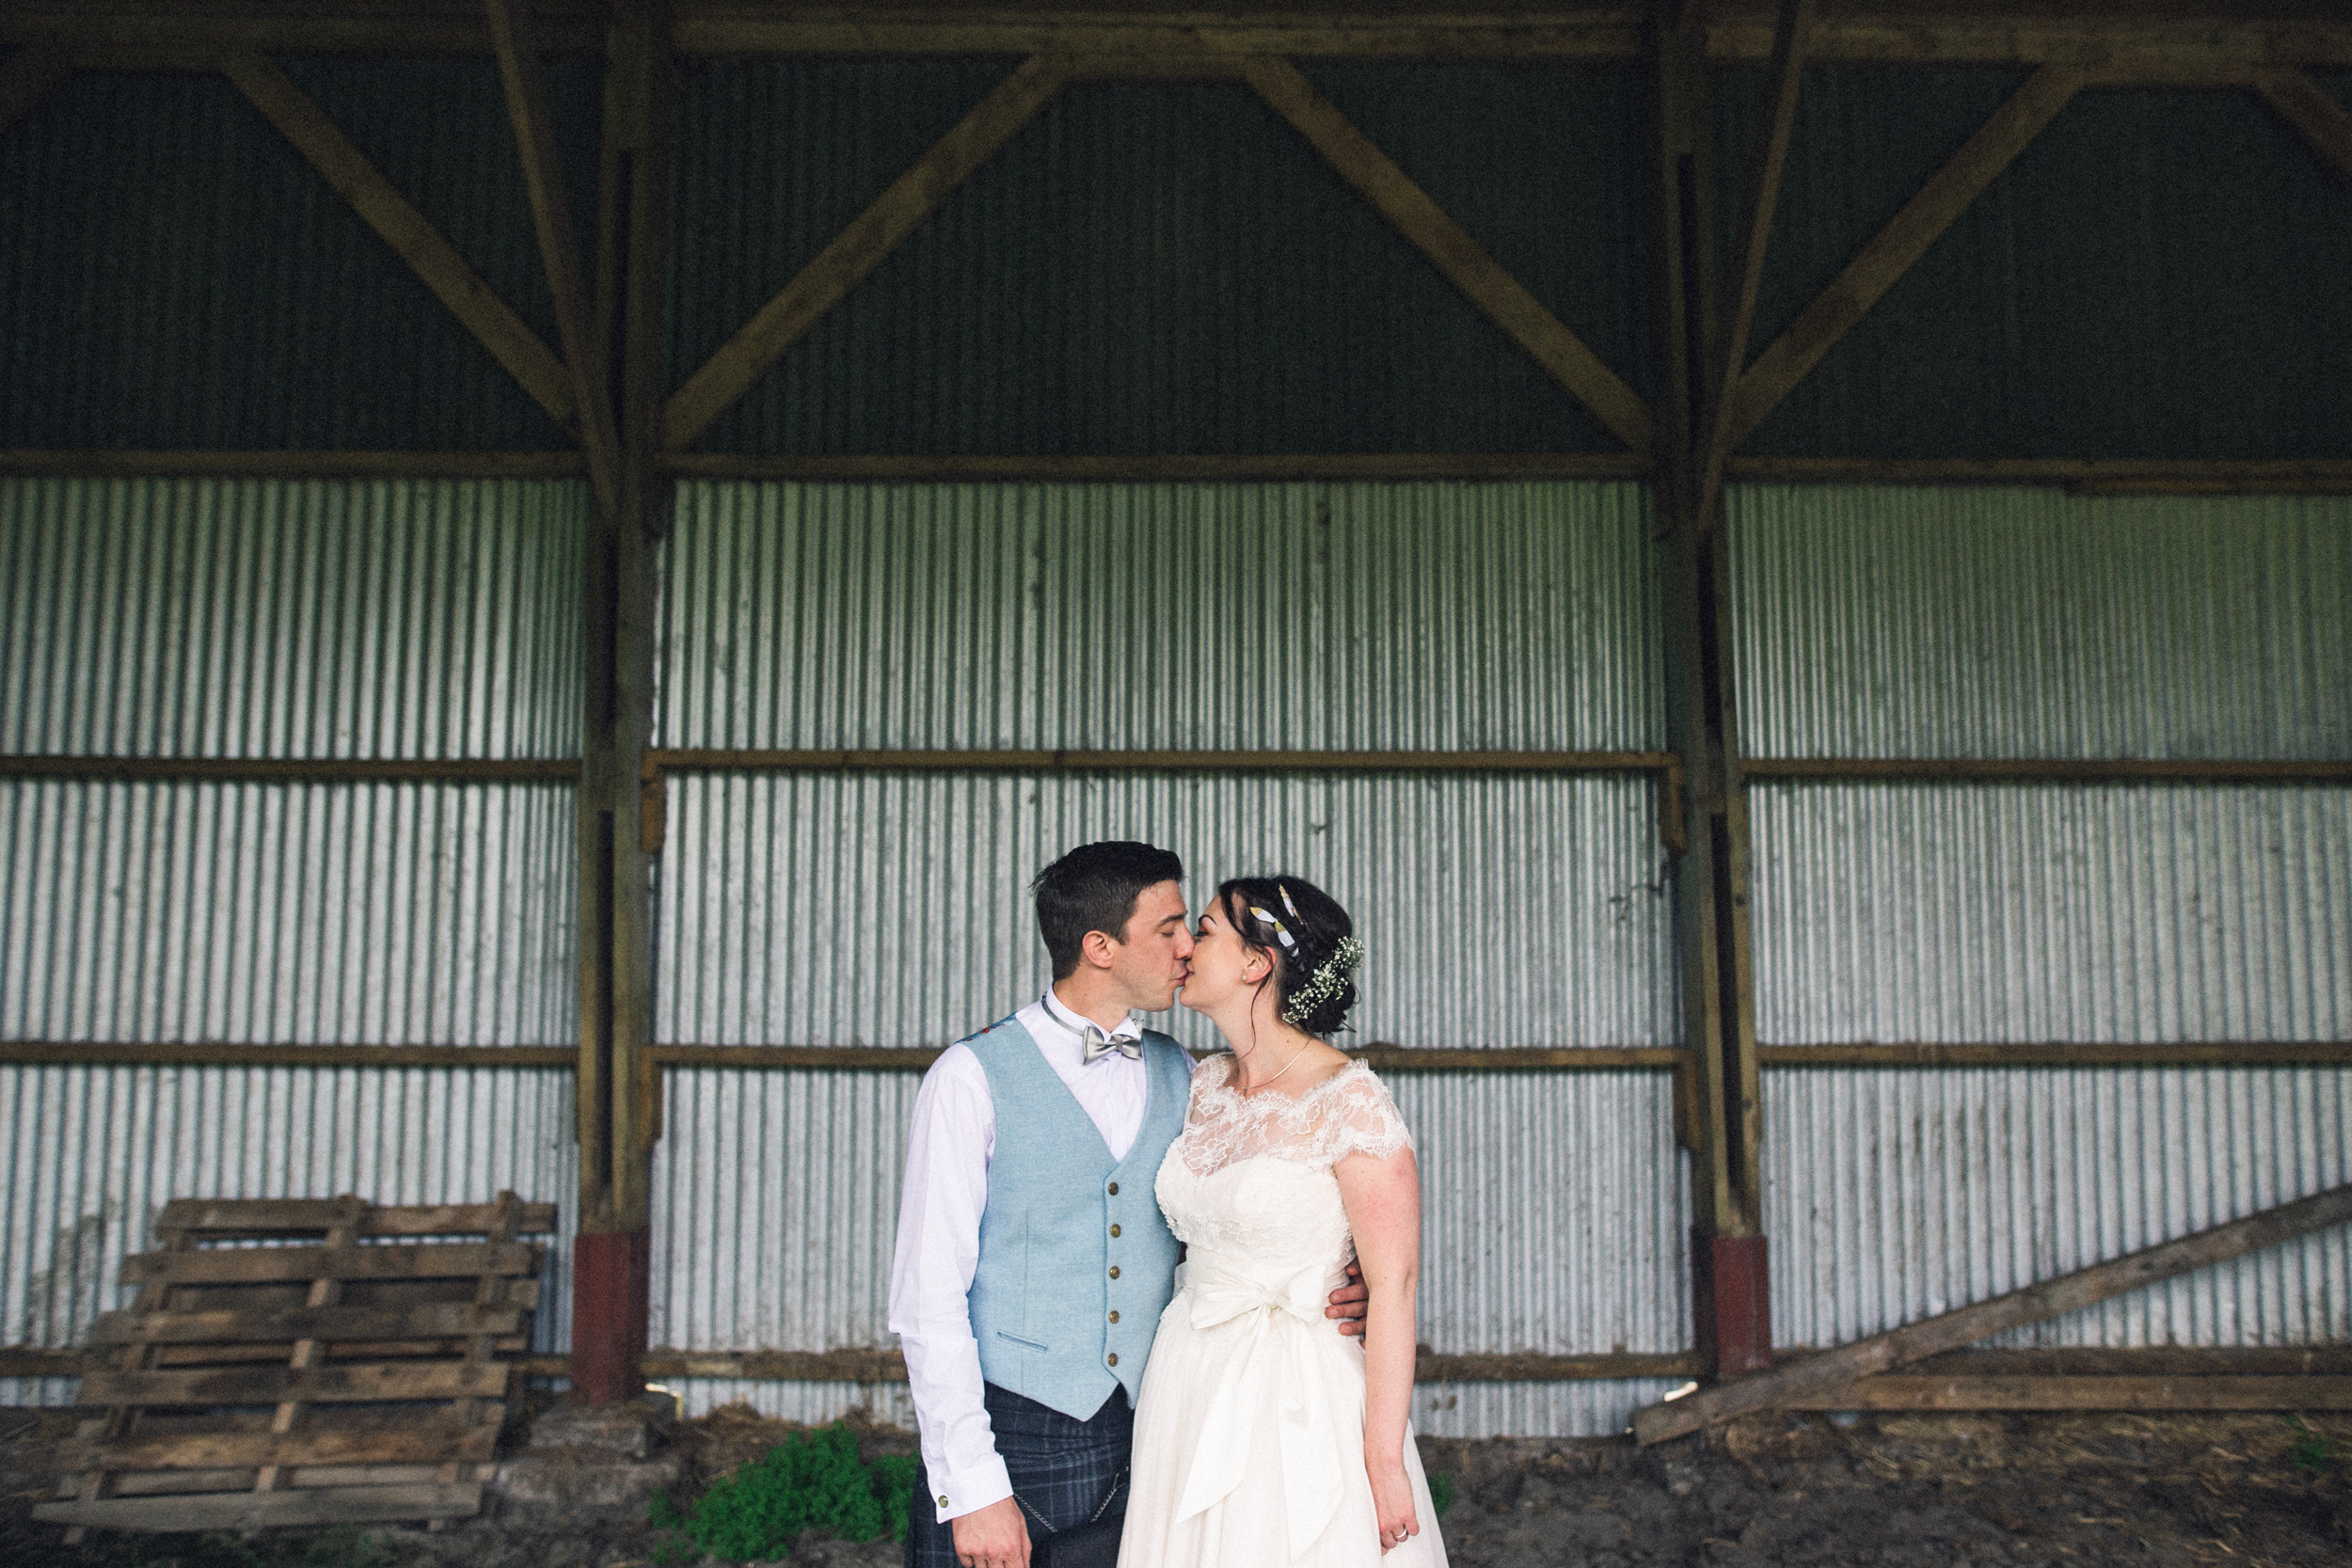 creative-wedding-photography-teesside-north-east-yorkshire-109.jpg